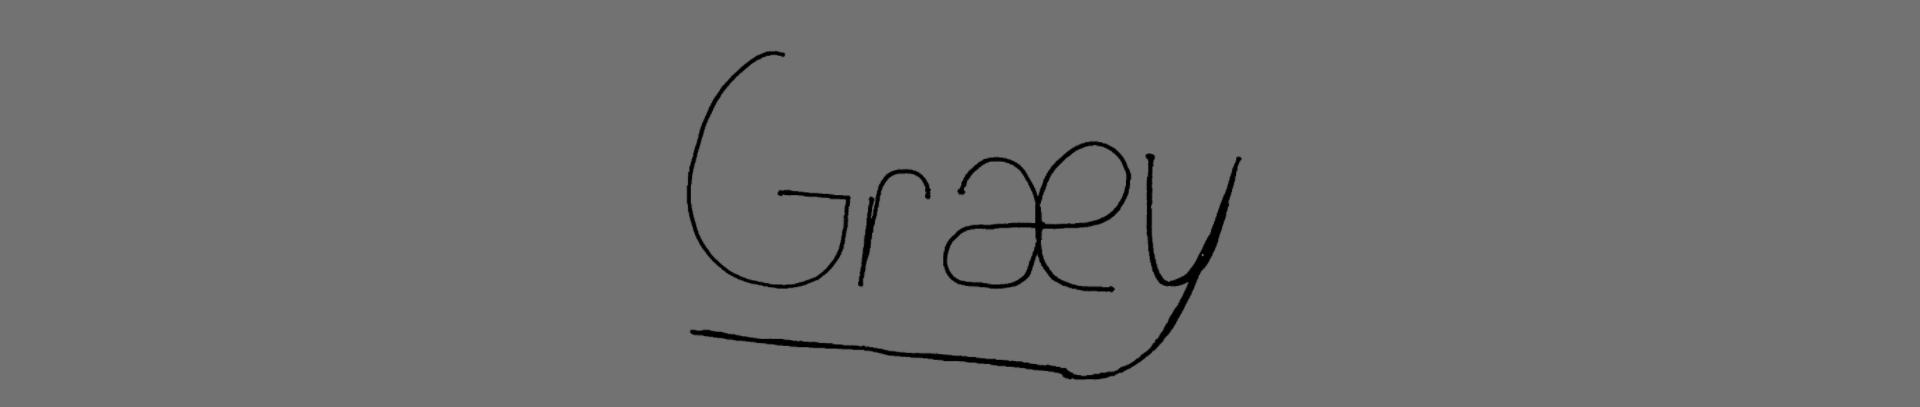 Graey